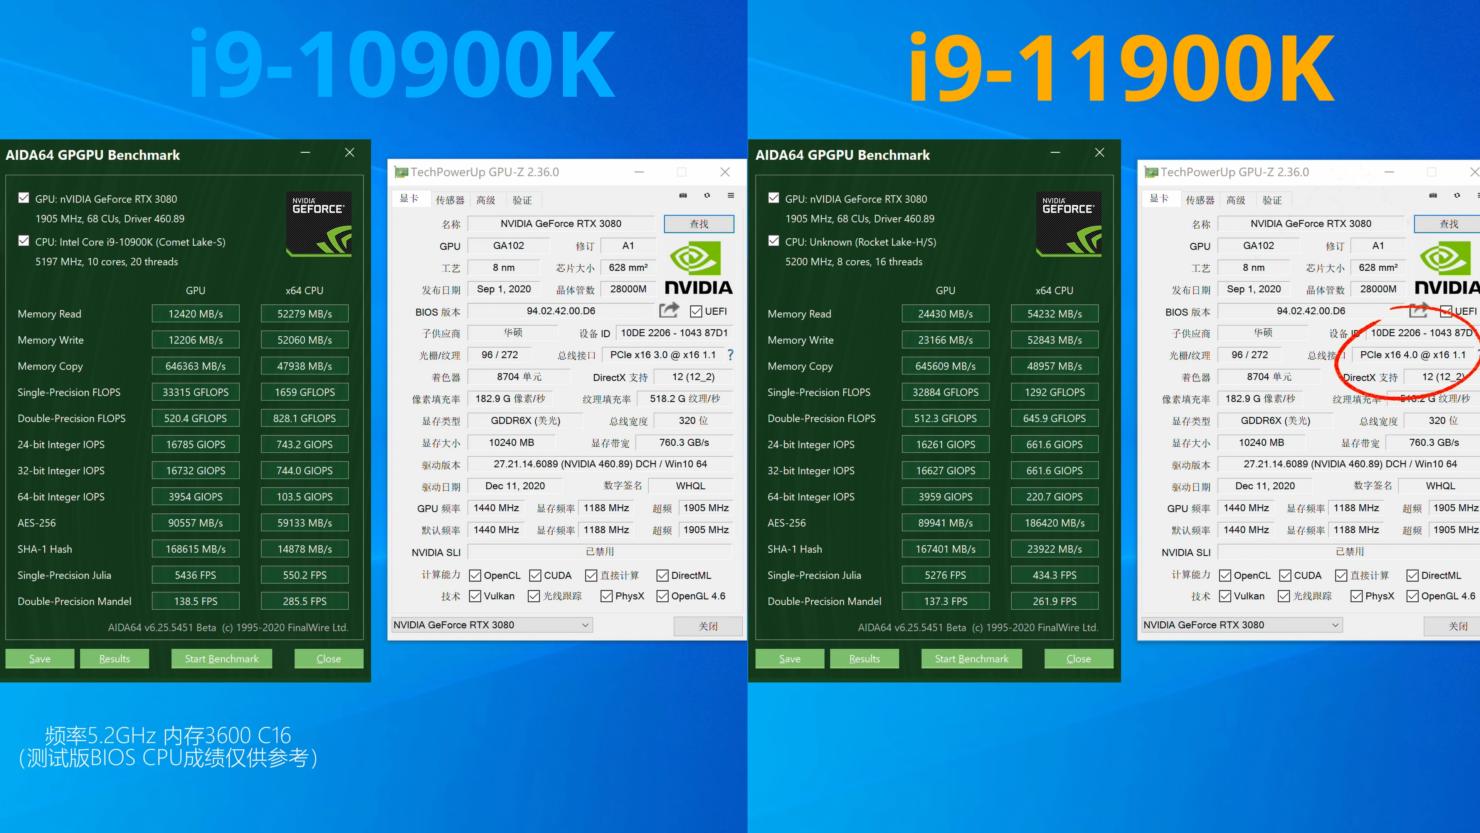 intel-core-i9-11900k-8-core-rocket-lake-vs-core-i9-10900k-10-core-comet-lake-cpu-_-5-2-ghz-overclock-_-aida64